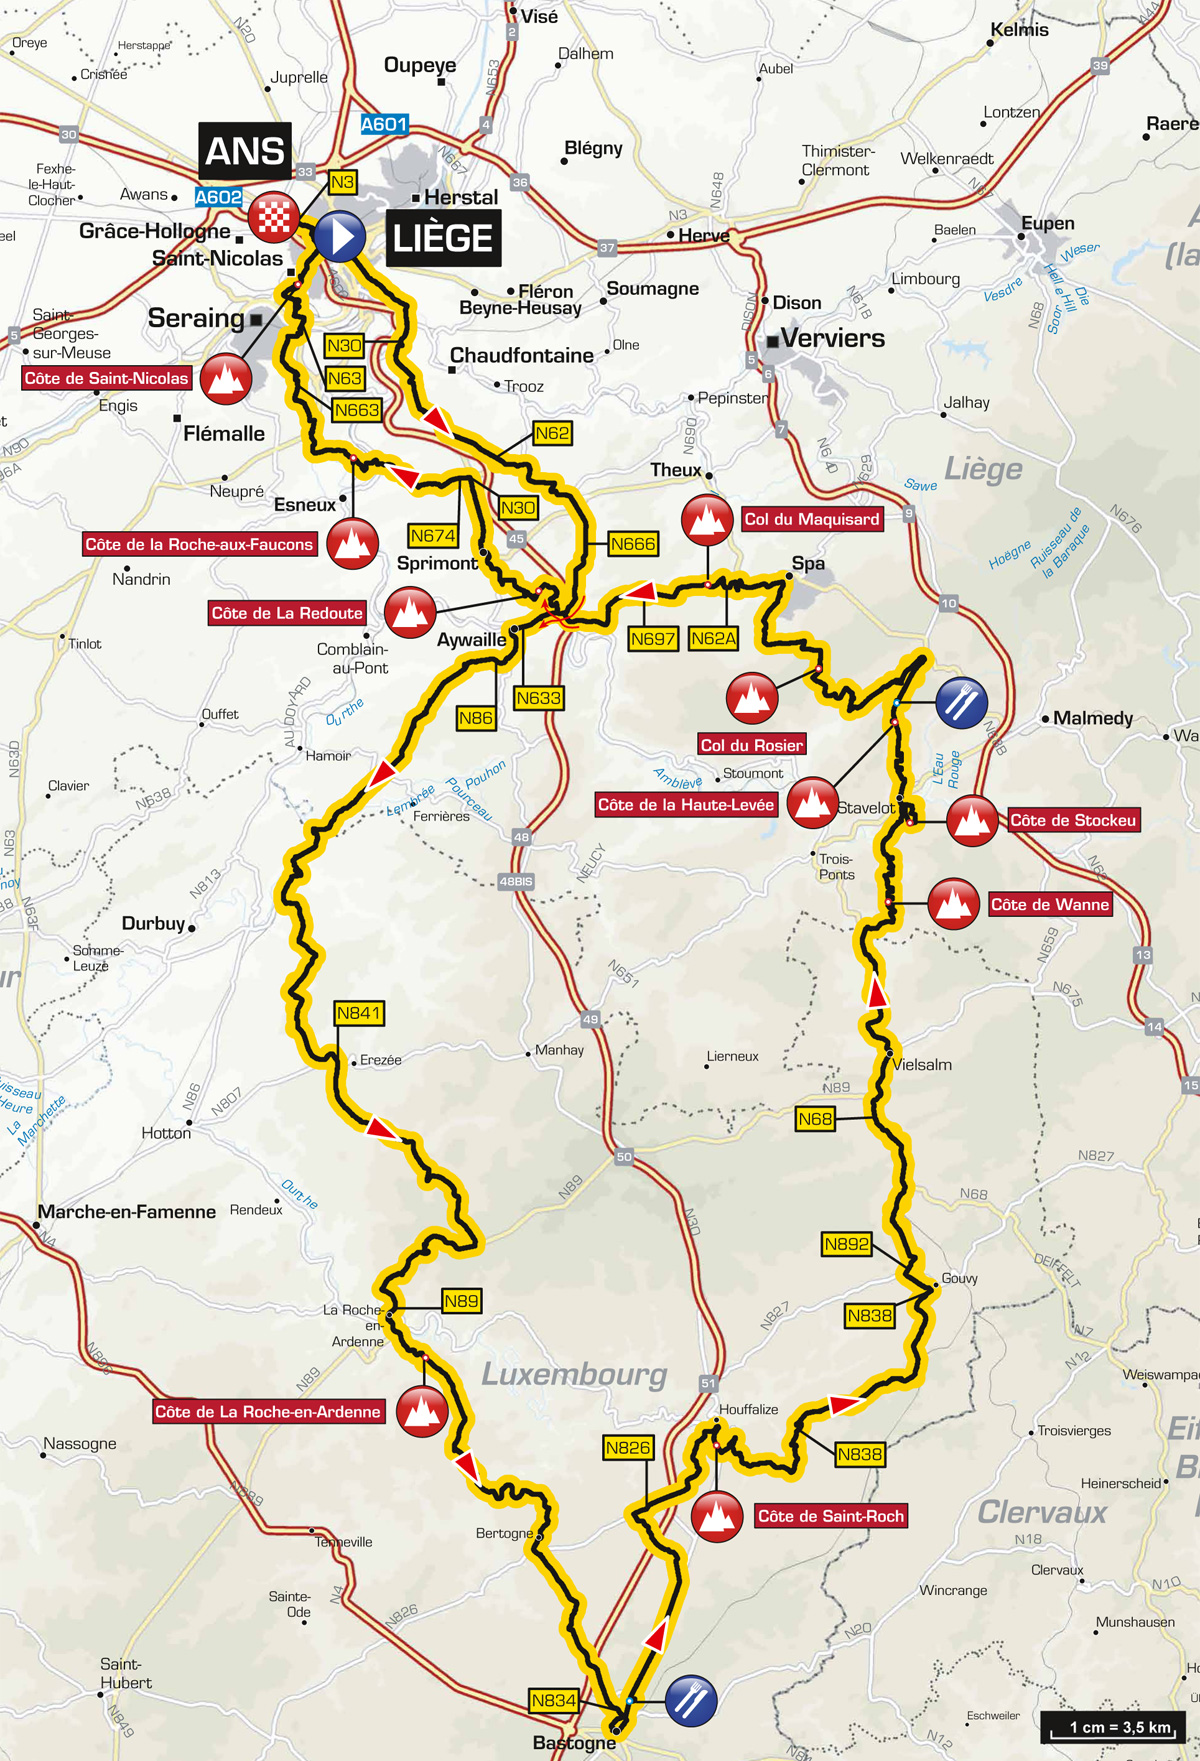 Karte Lüttich-Bastogne-Lüttich 2015